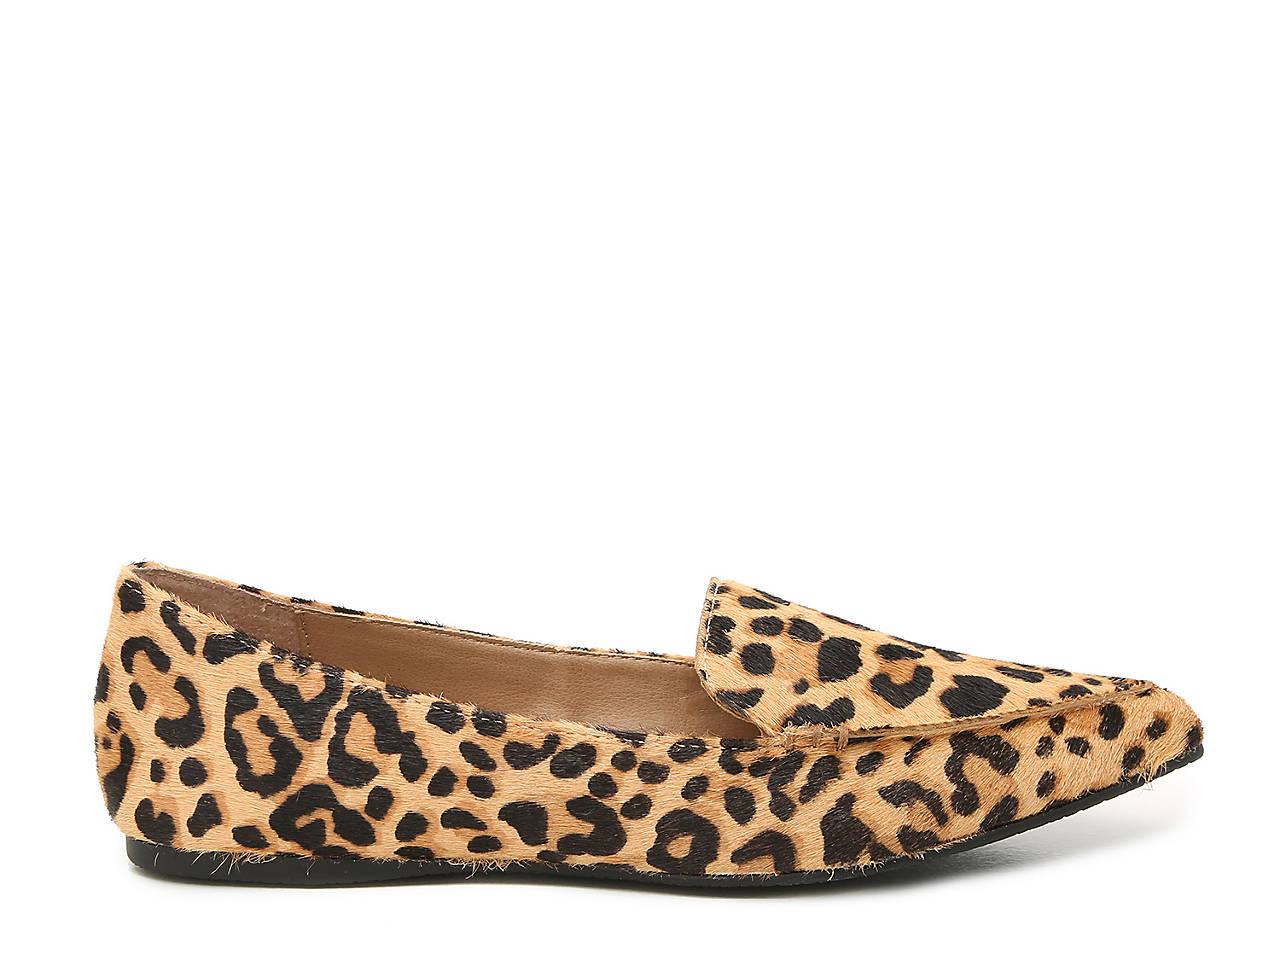 b18496ca9de Steve Madden Feather Loafer Women s Shoes